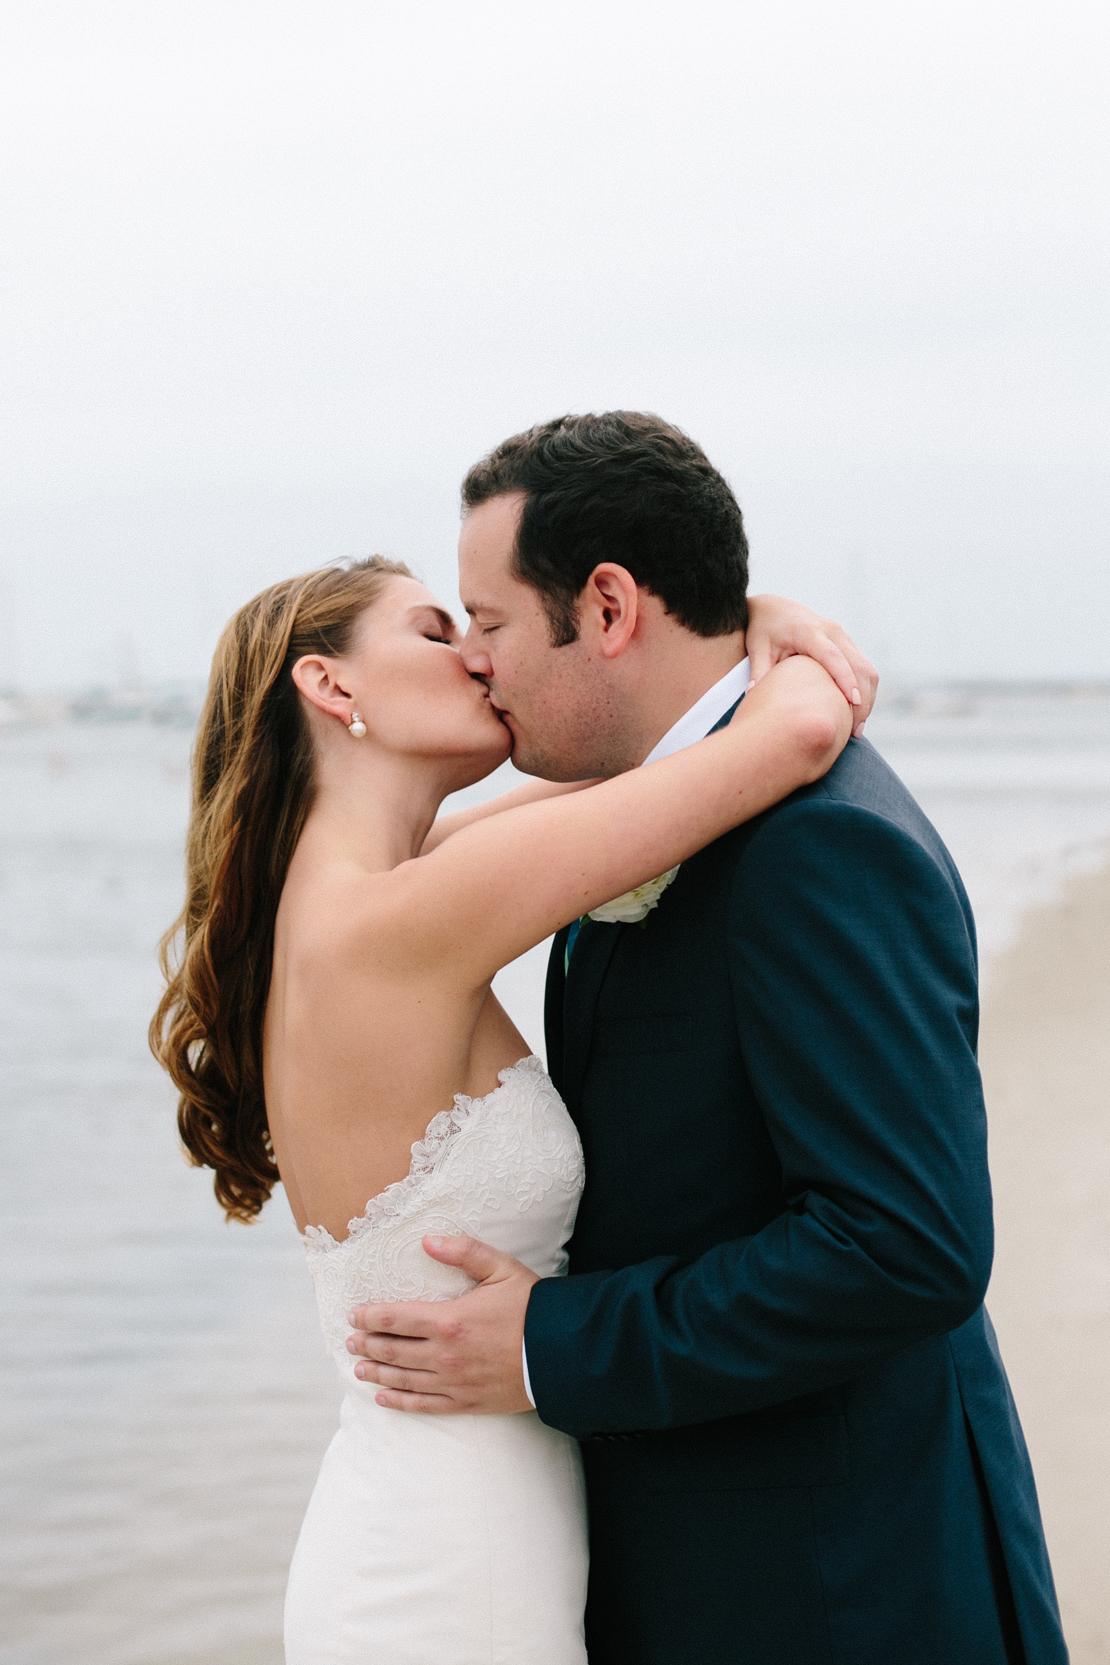 14_bride_groom_kiss_on_wychmere_beach_club_dock_wedding